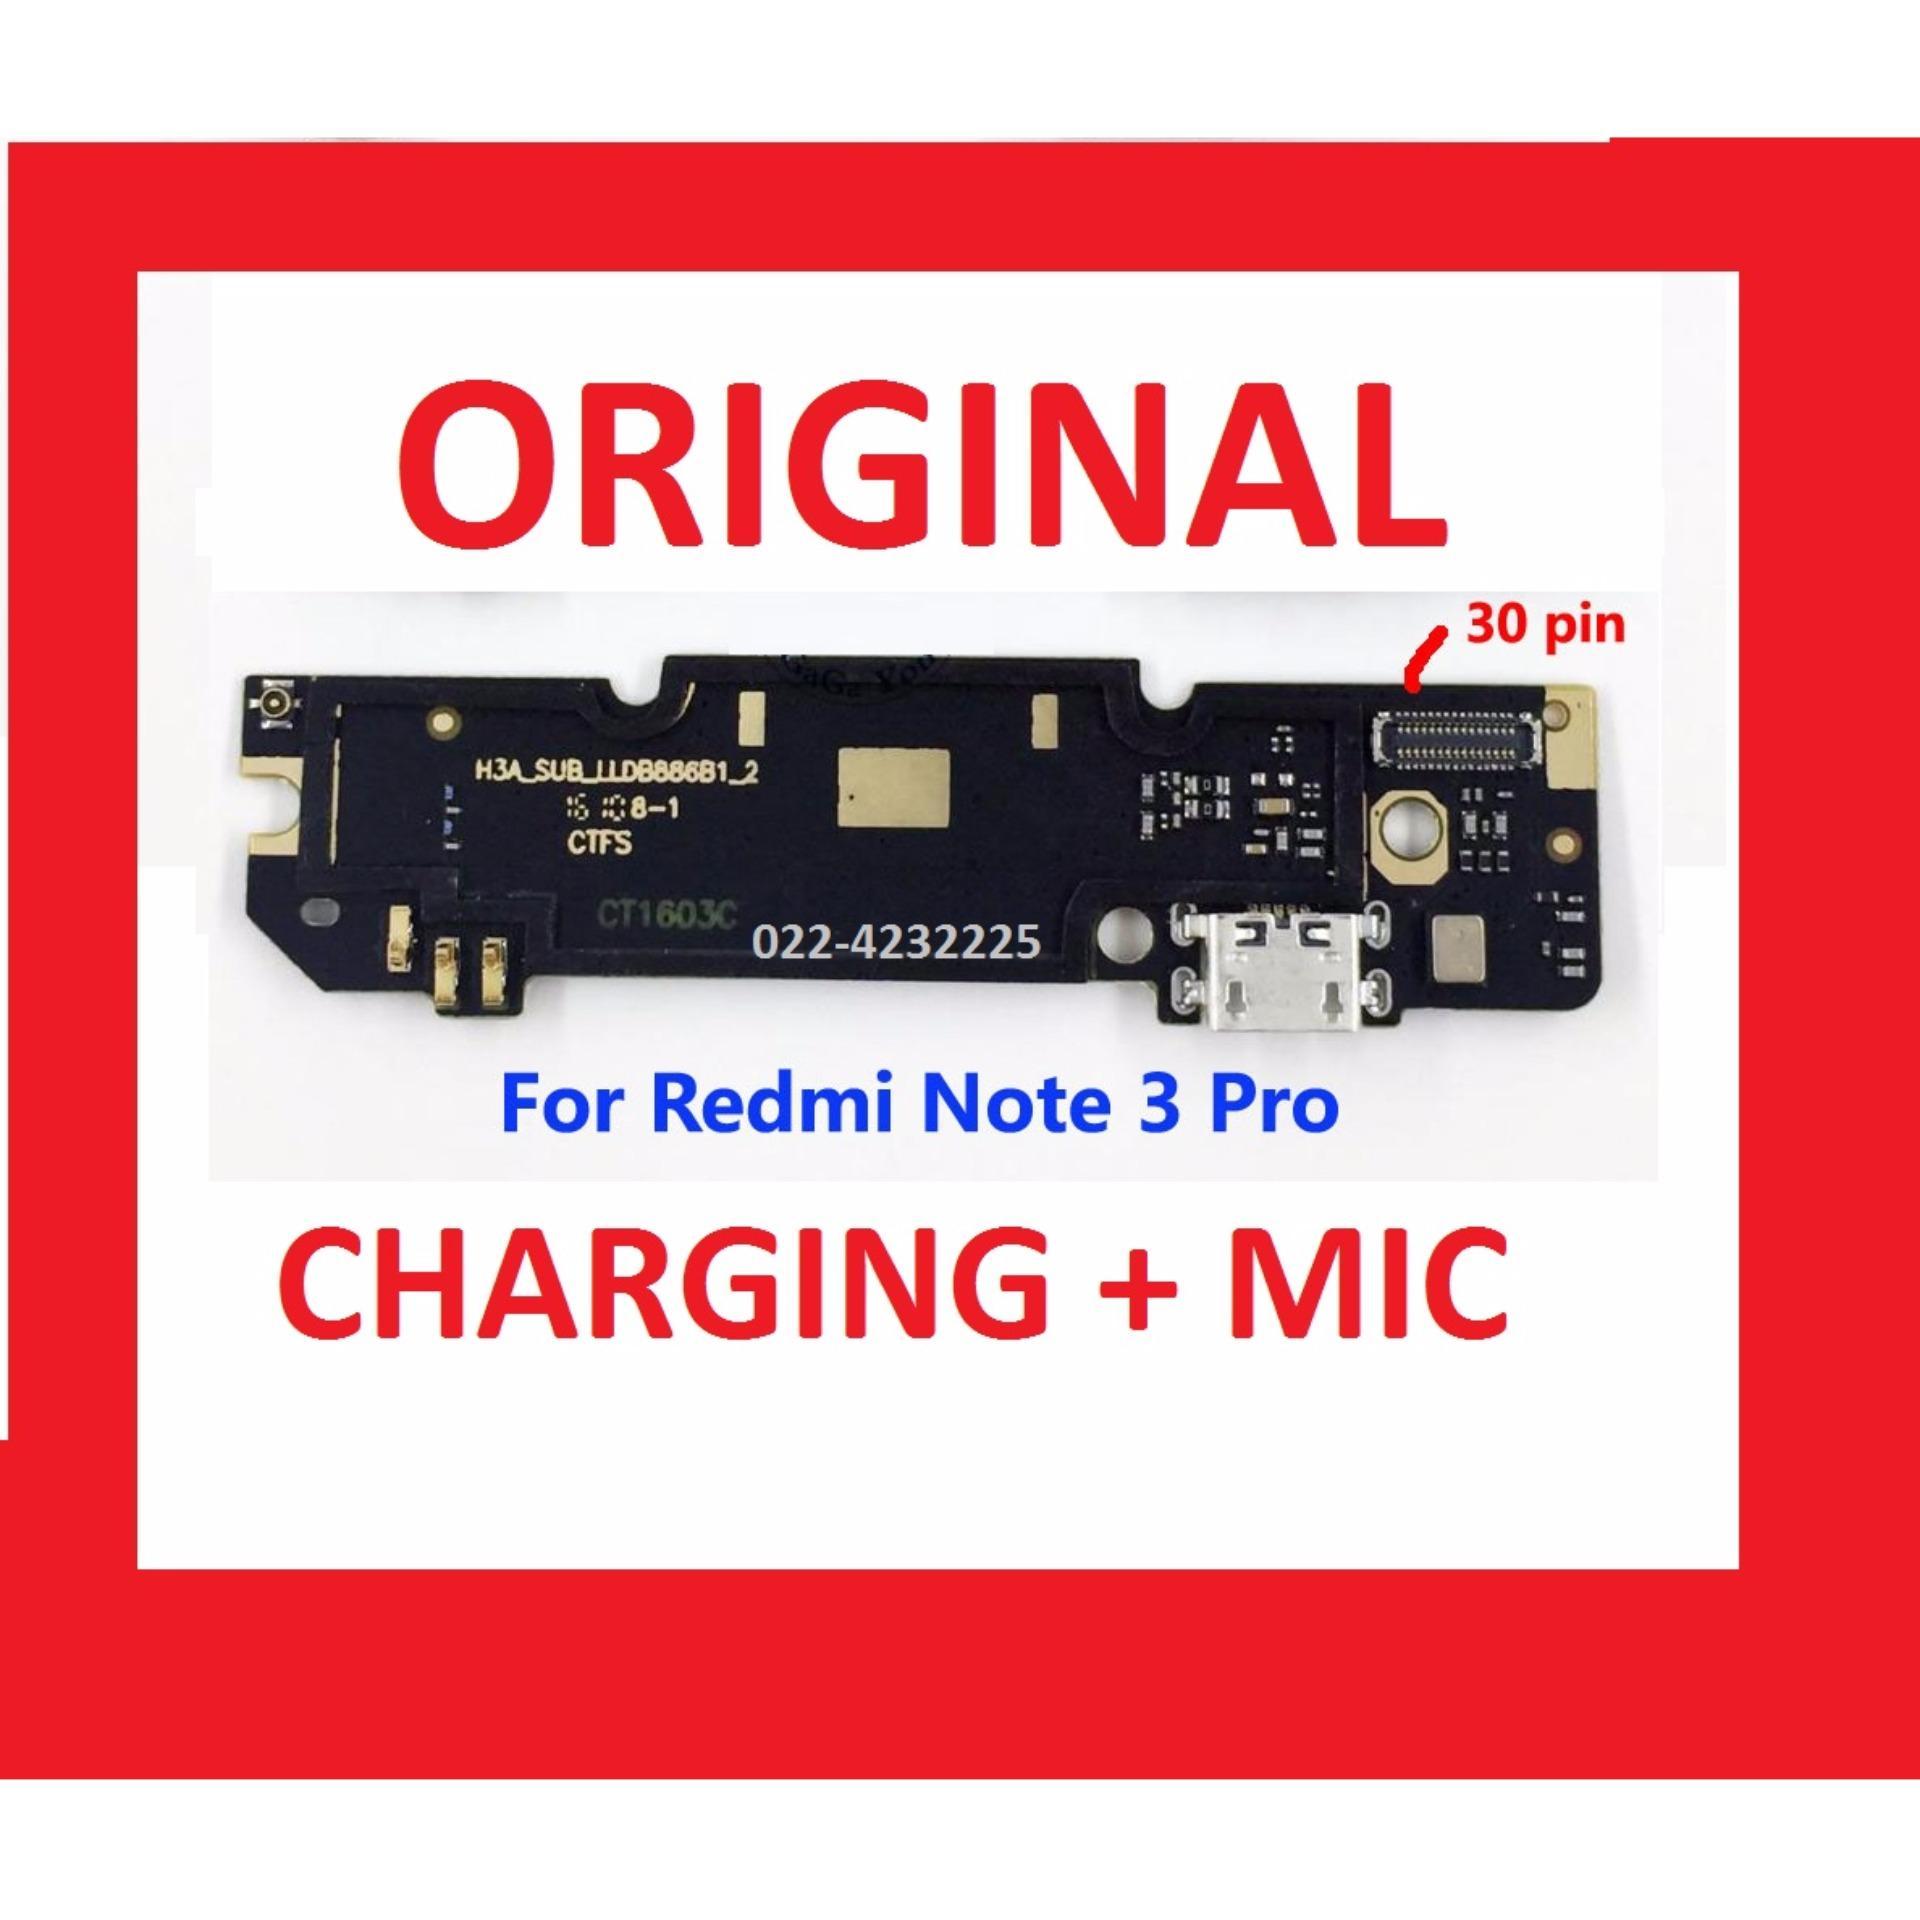 XIAOMI REDMI NOTE 3 PRO FLEXI FLEX FLEXIBLE FLEKSIBEL PORT CONNECTOR KONEKTOR CHARGER MICROPHONE ORI ORIGINAL